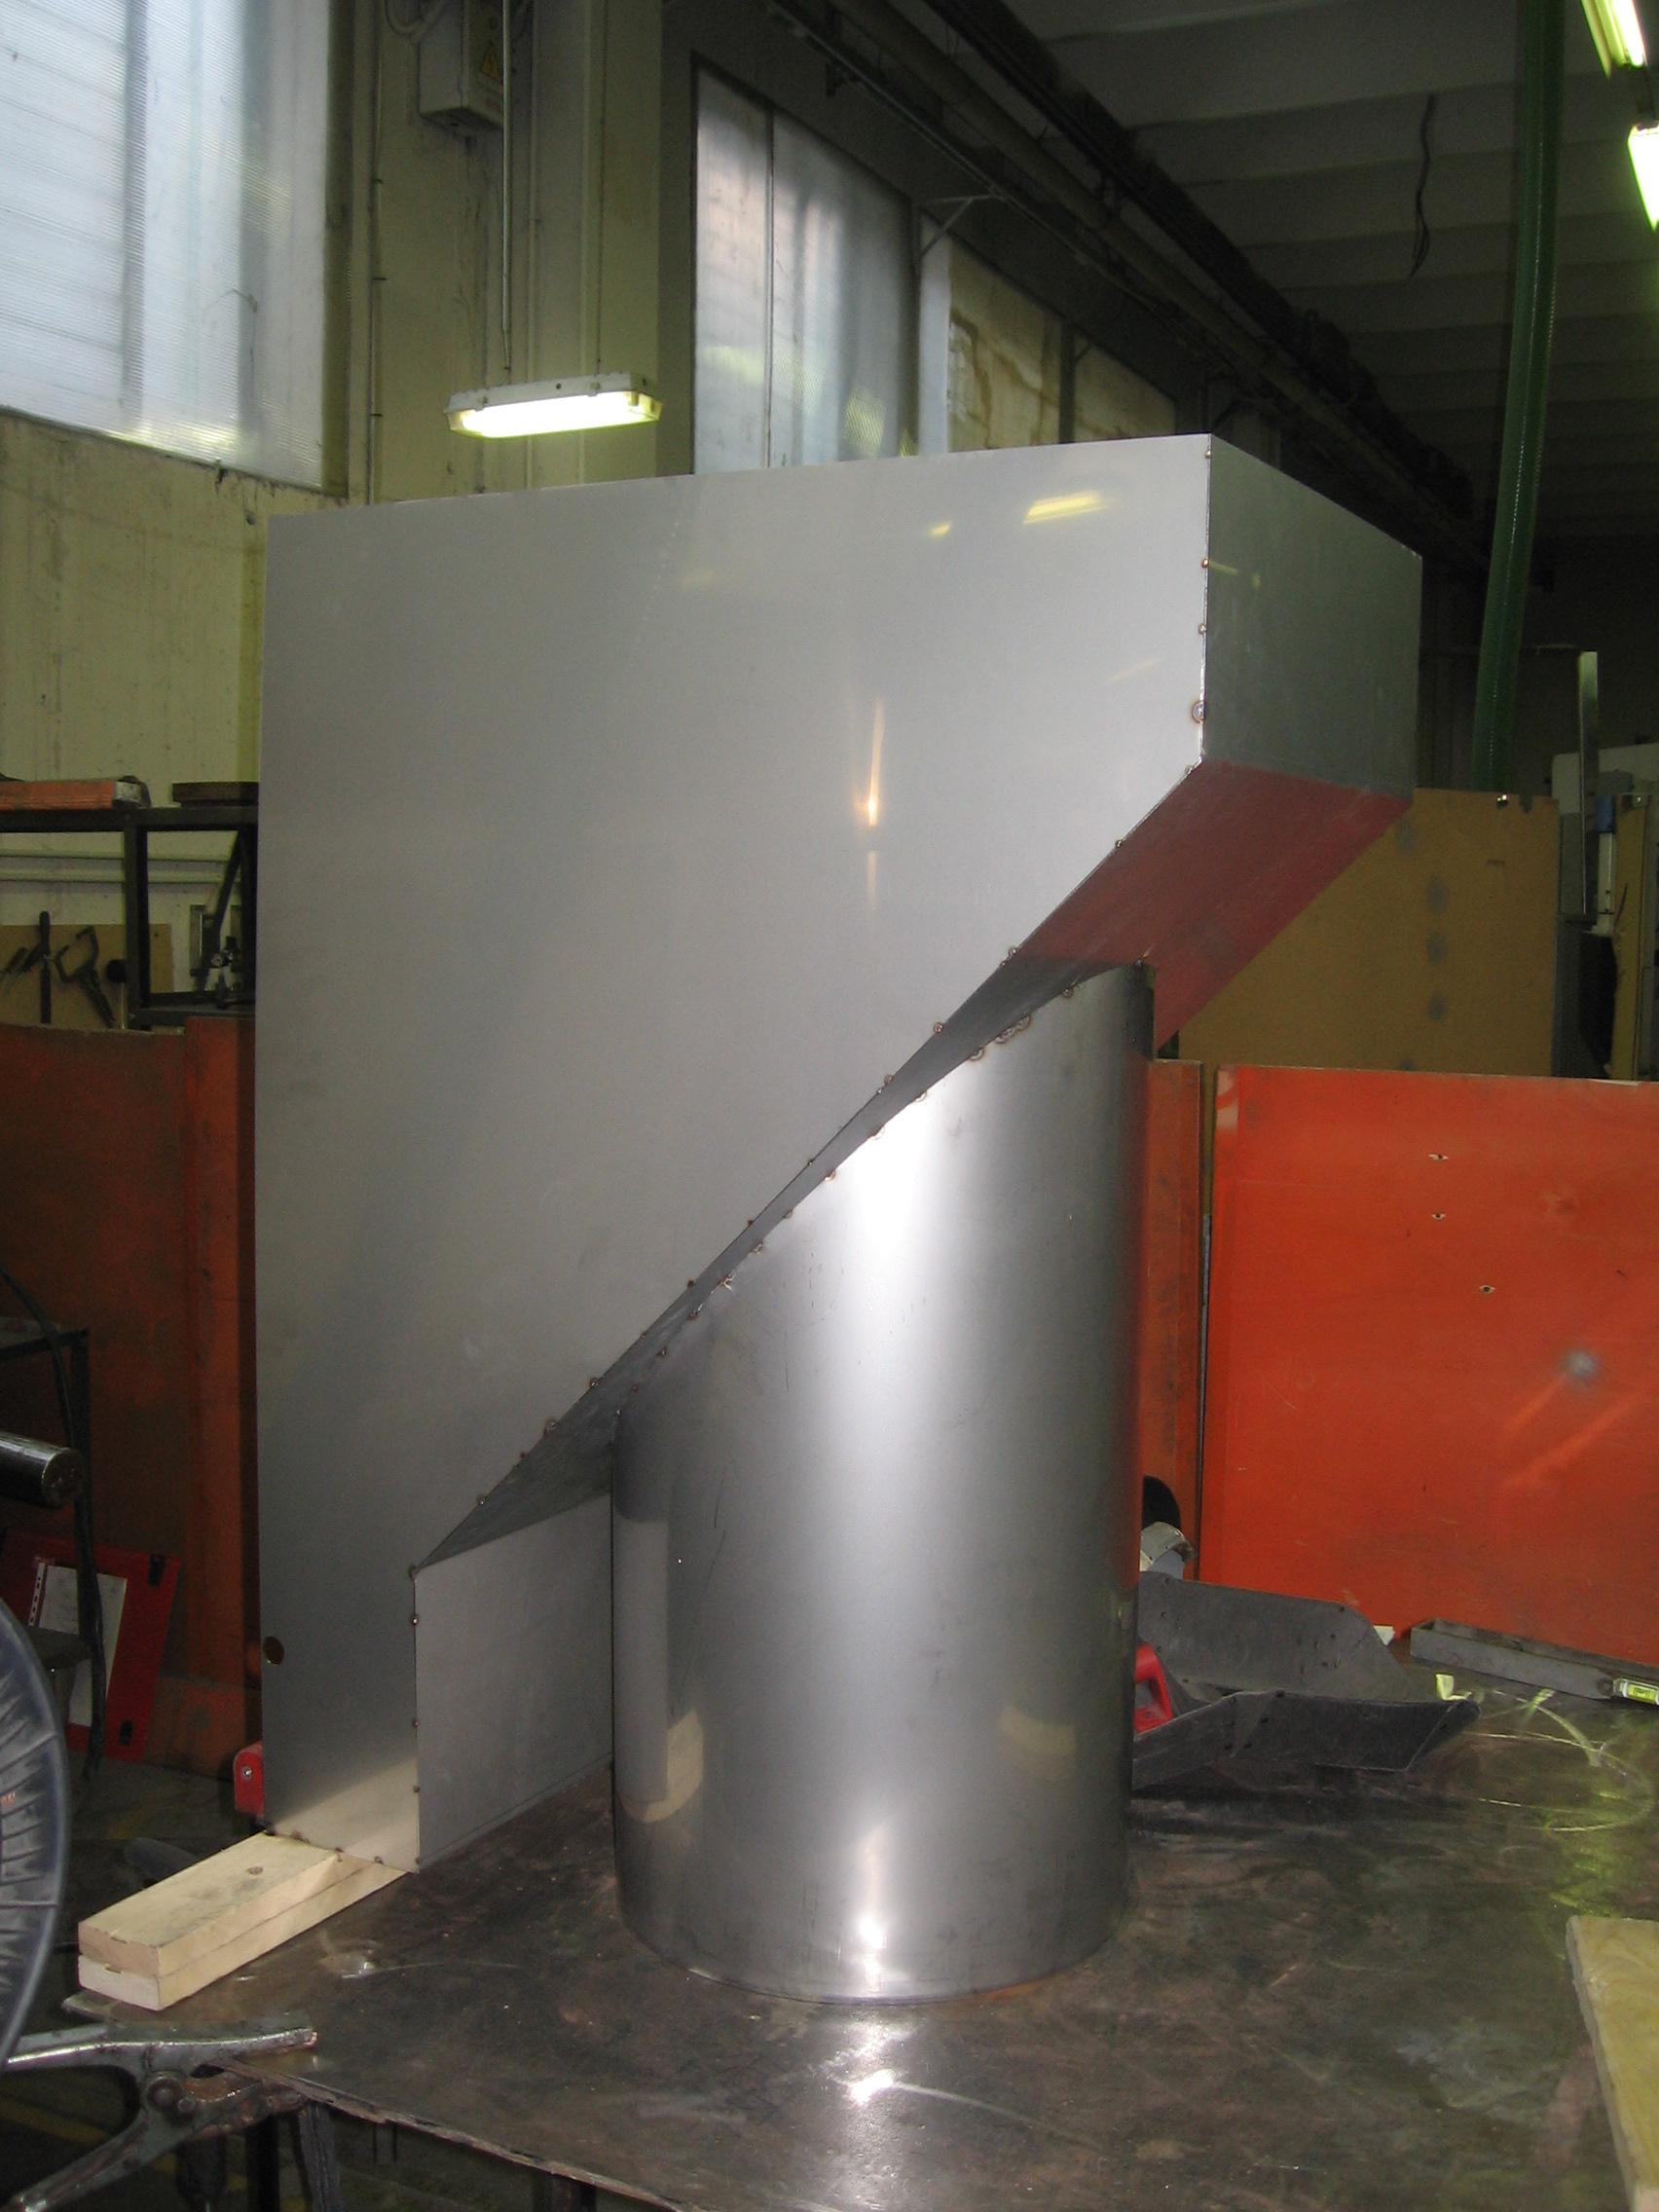 raccordi-speciali-in acciaio-inox